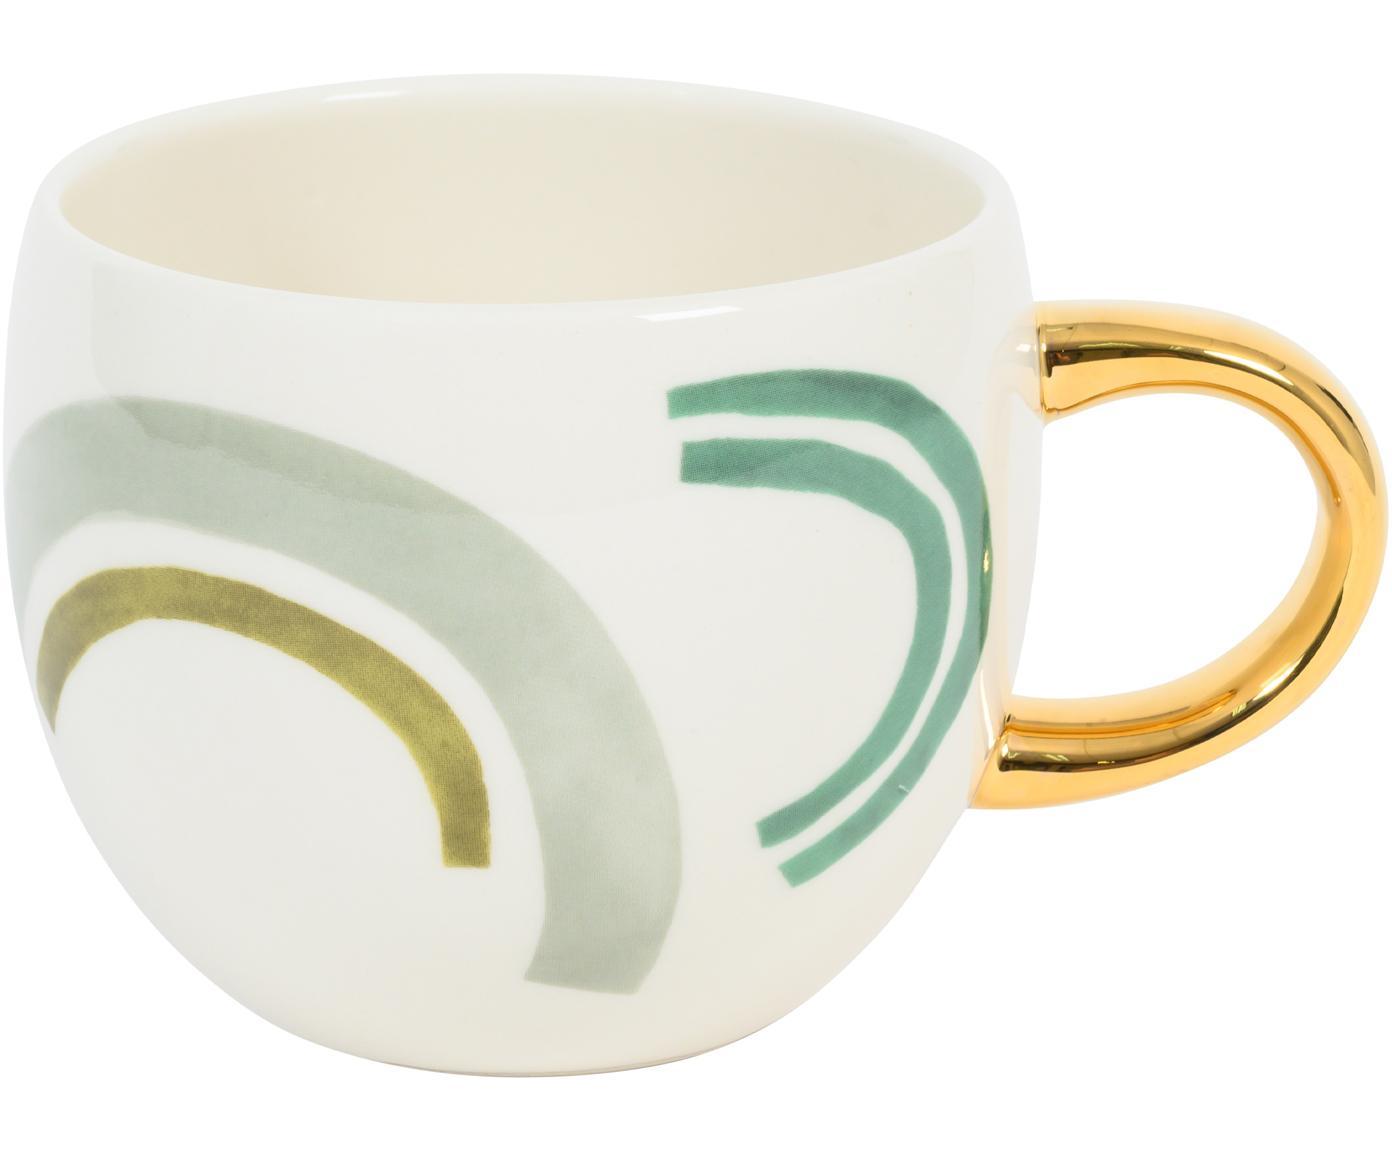 Bemalte Tasse Bounce mit goldenem Griff, Steingut, Mehrfarbig, Ø 11 x H 9 cm